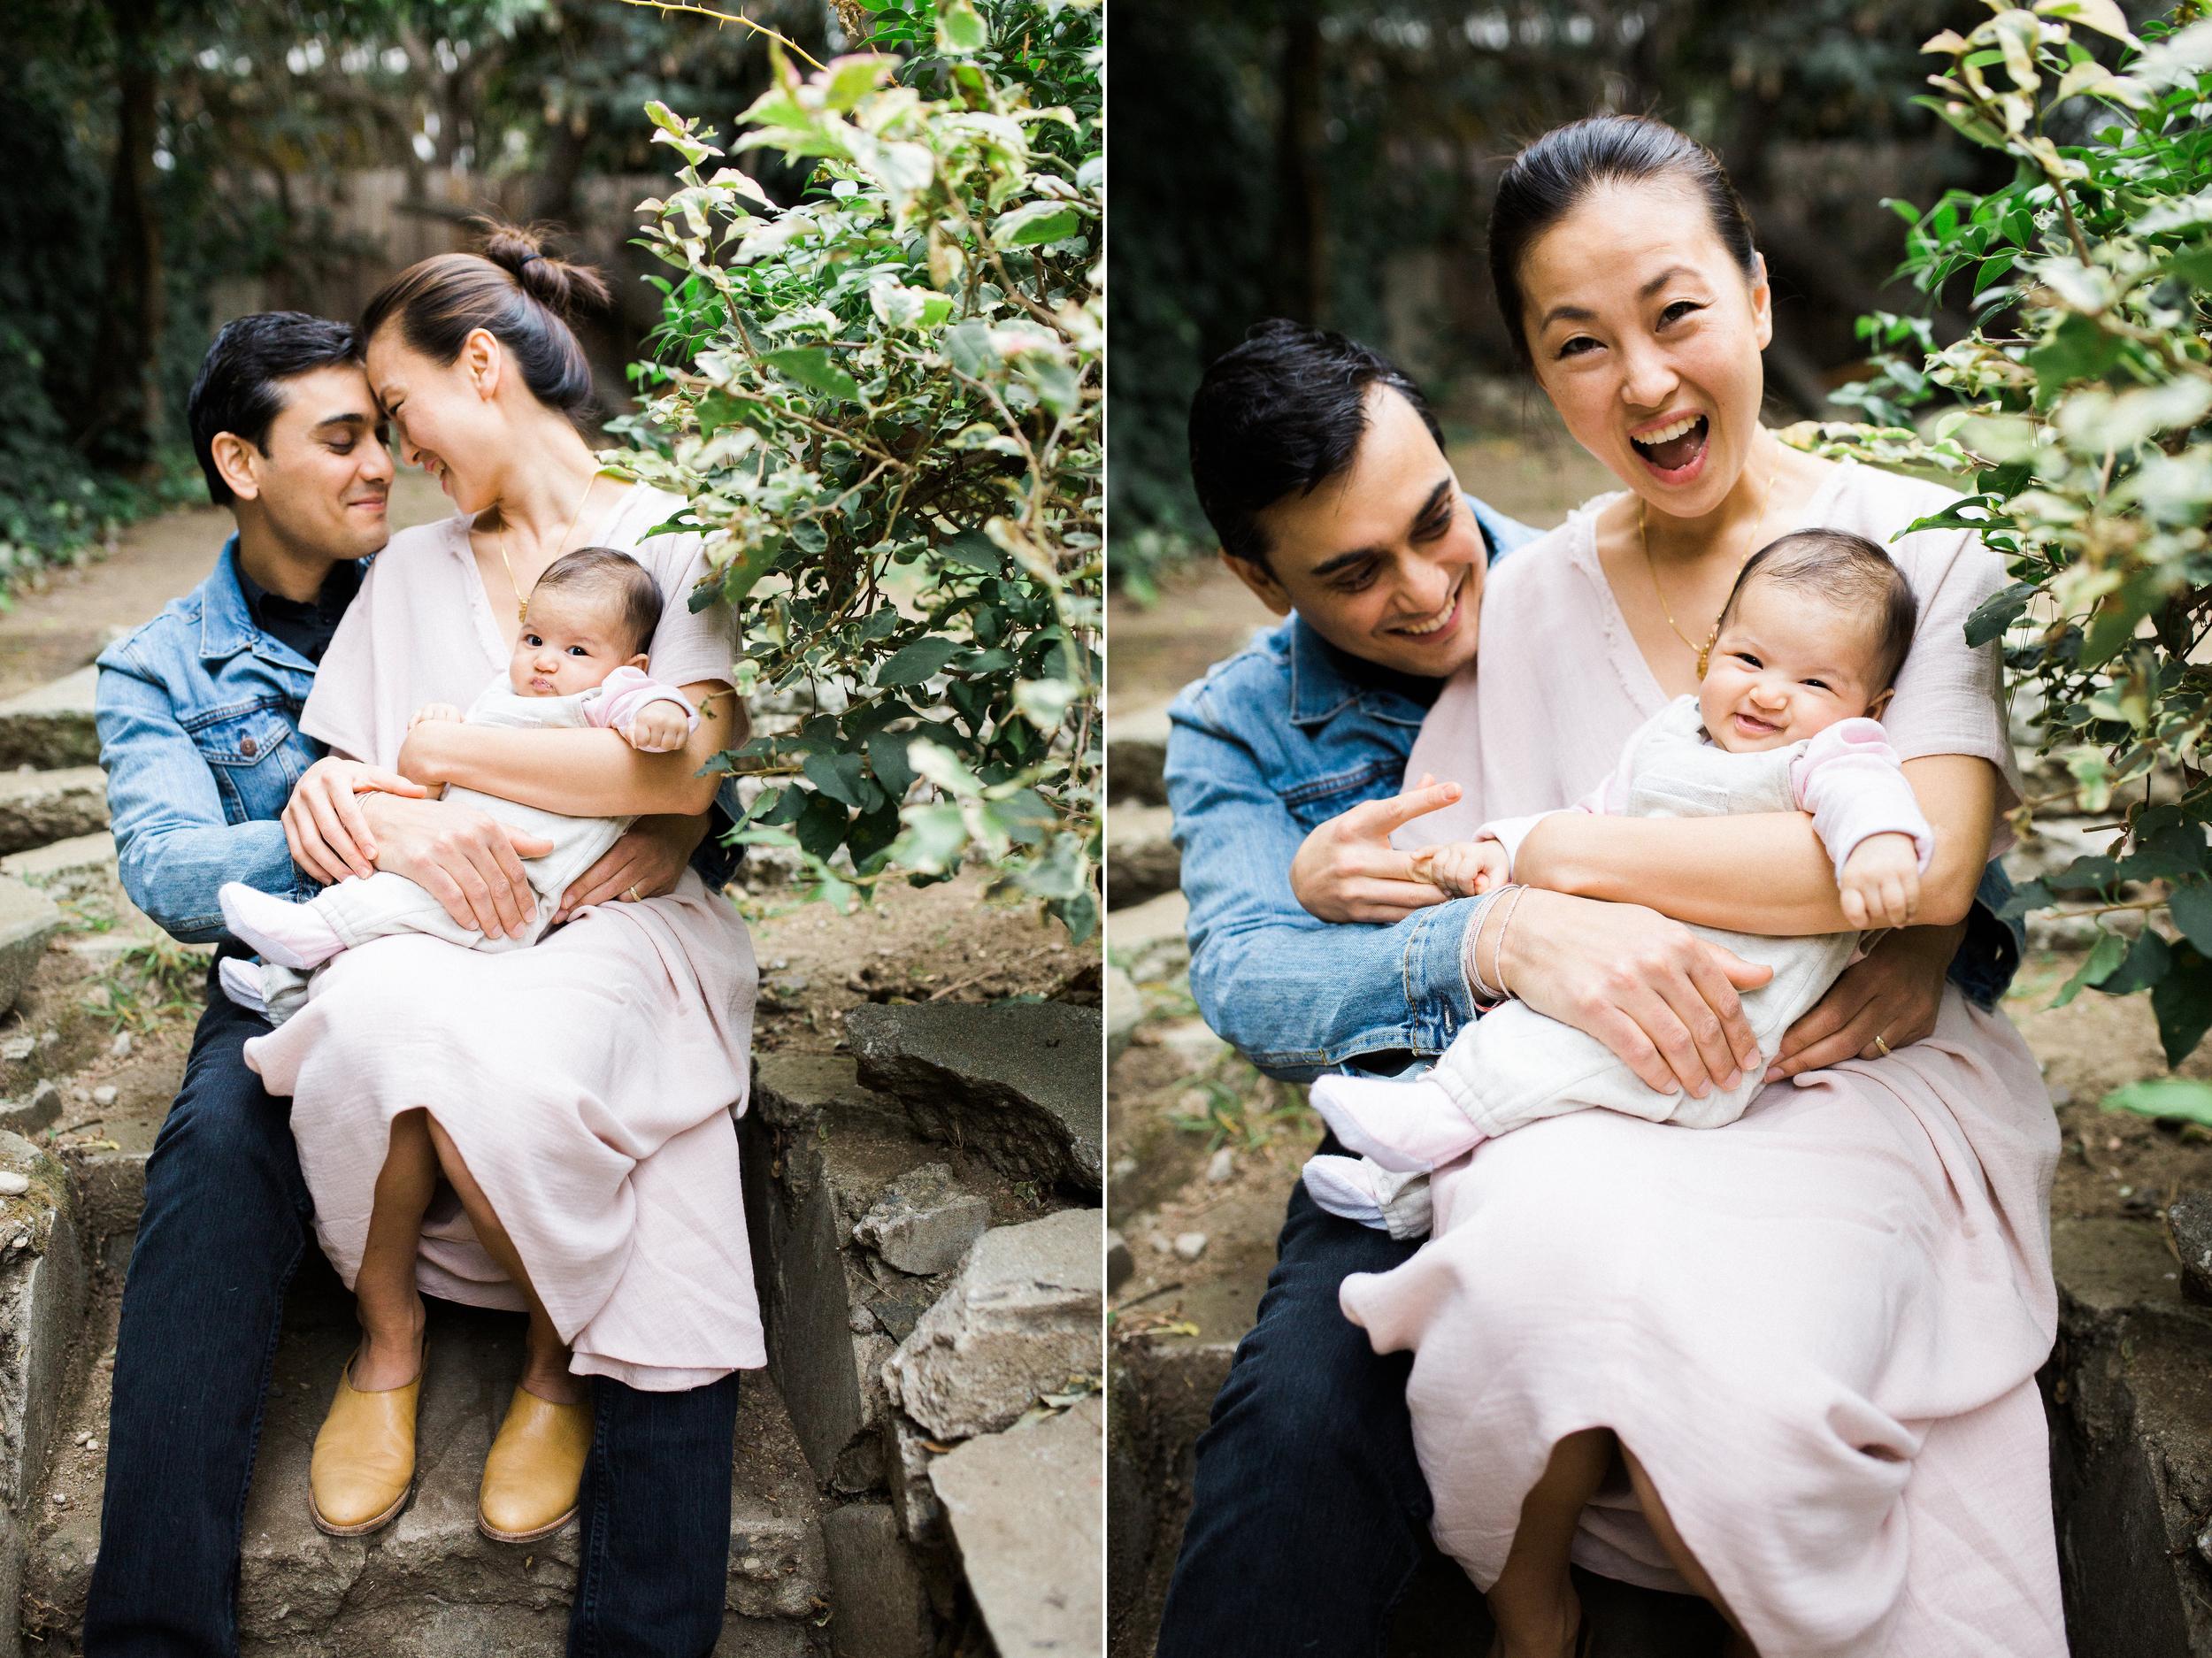 mehana-family-session_la-los-angeles-family-photographer-laurel-canyon_8.jpg